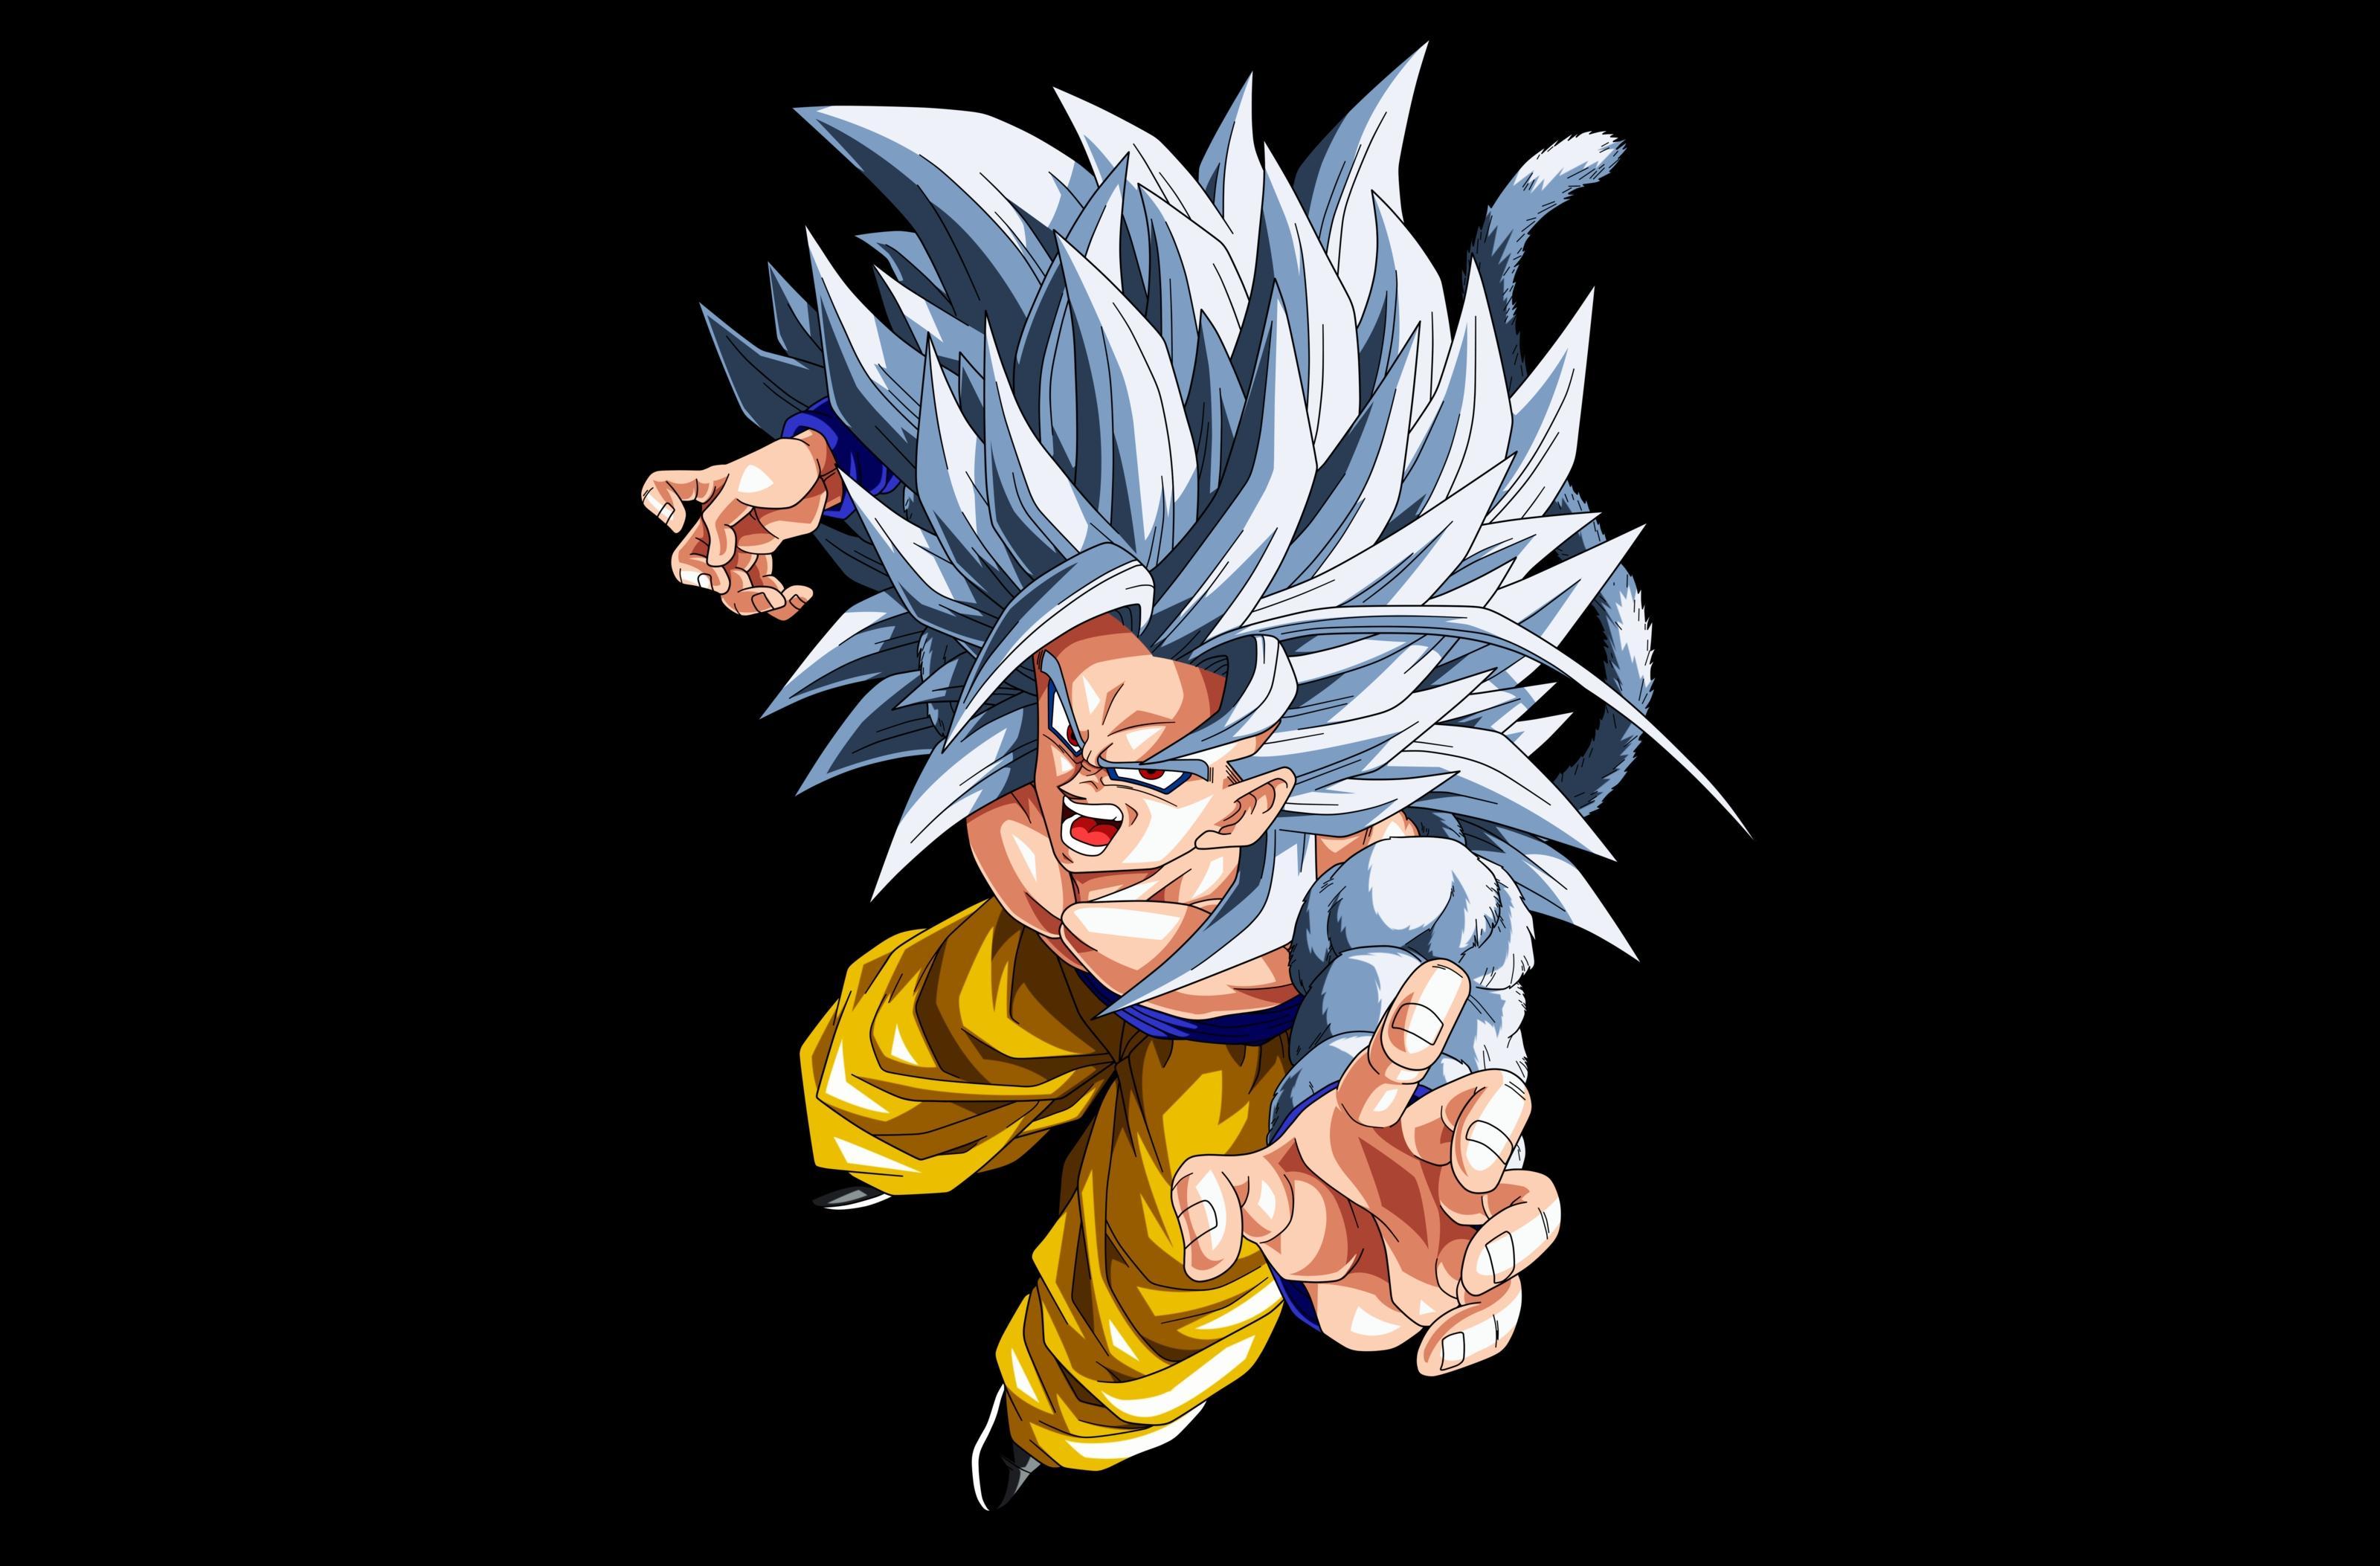 Goku Super Saiyan 4 Wallpaper Wallpapersafari